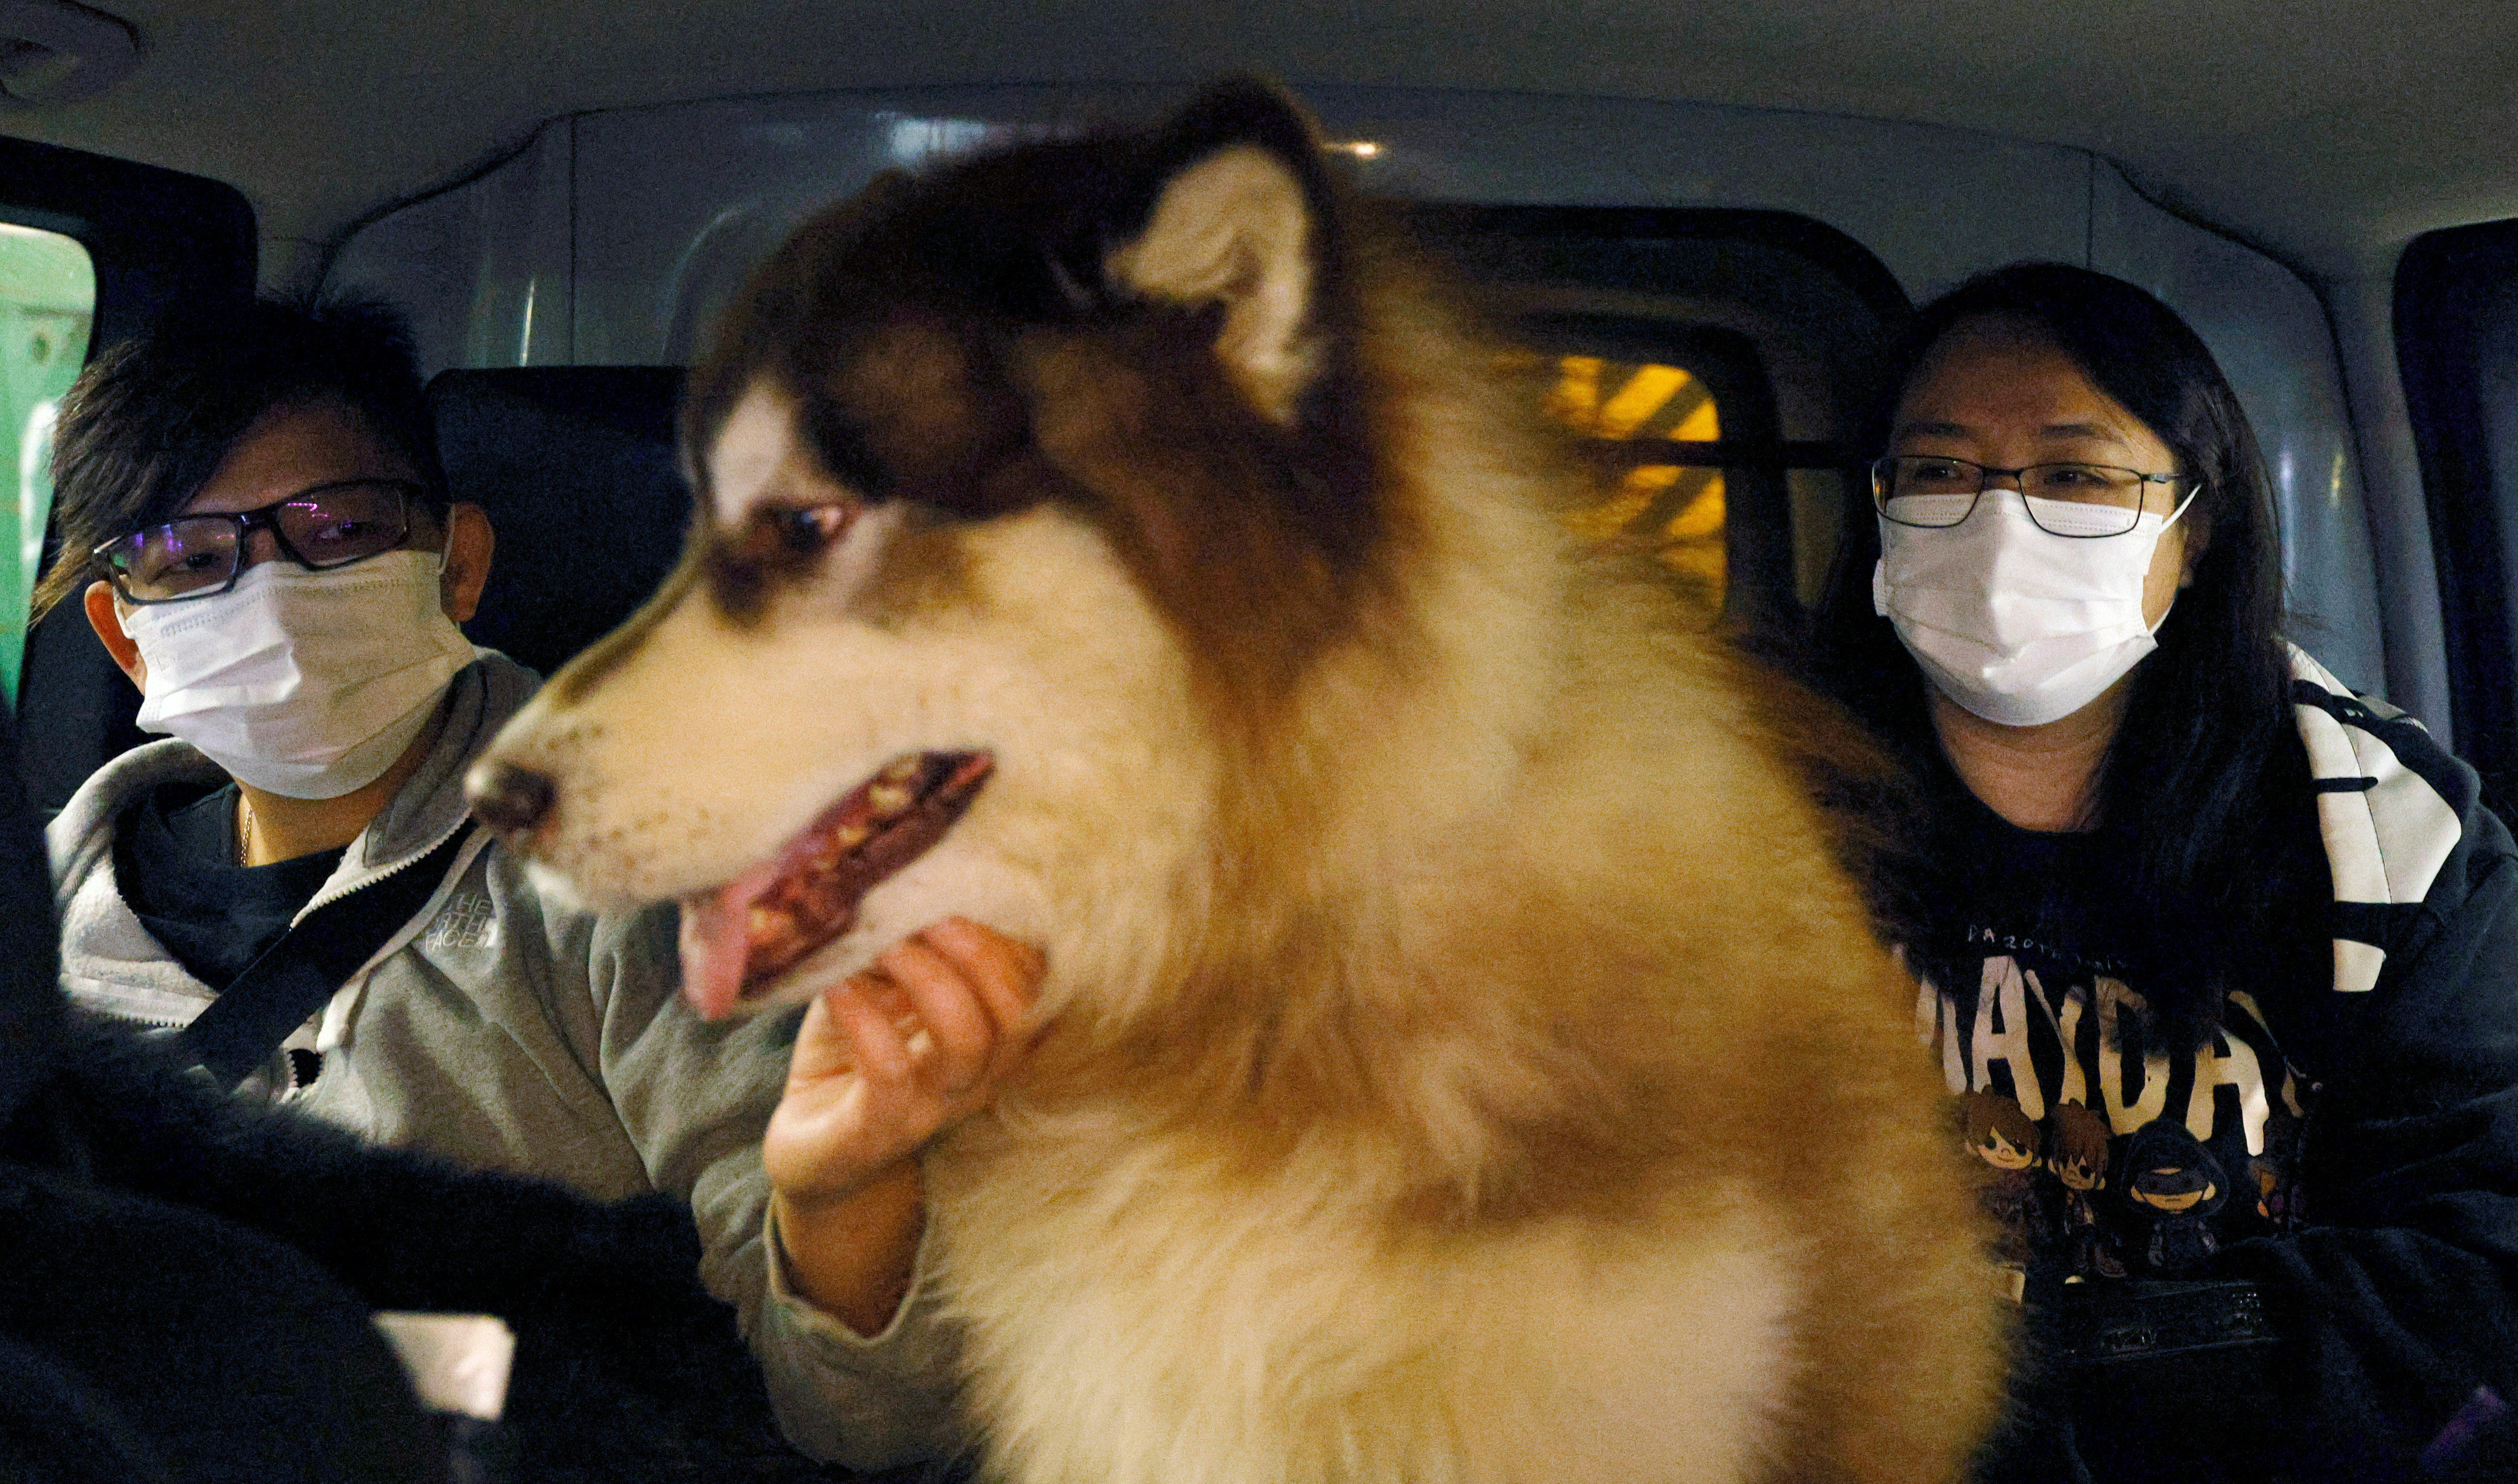 A Siberian husky rides in a car